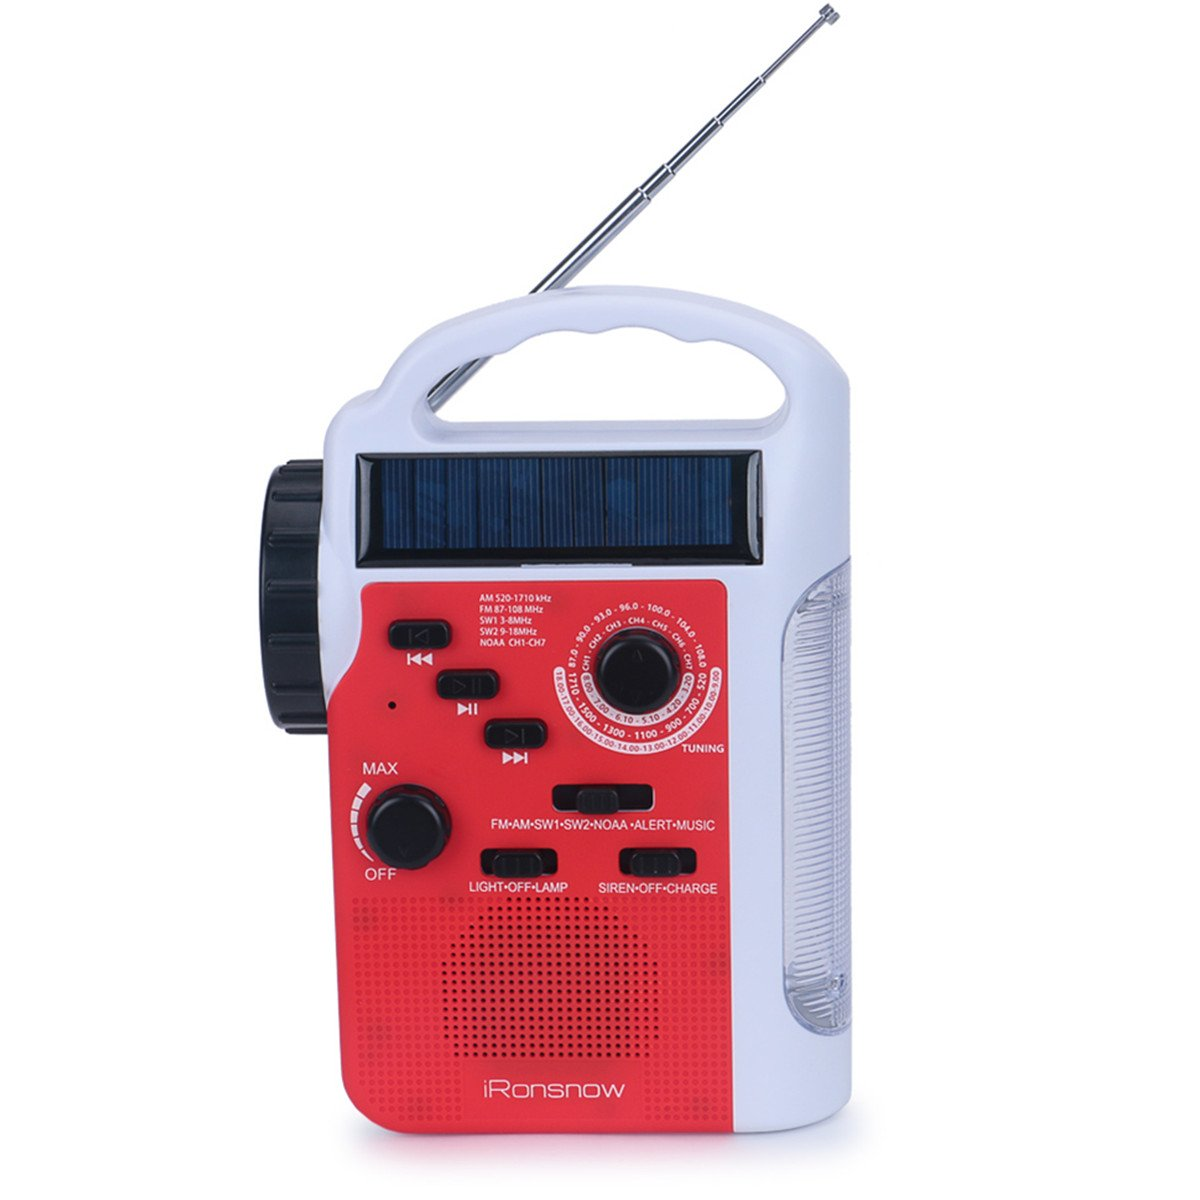 iRonsnow IS-399 Real NOAA Alert Weather Radio Lantern, Solar Crank Emergency AM/FM / SW/NOAA Radio, TF Card Speaker, 5 LEDs Flashlight, 8 Headlamps, 2300mAh Rechargeable Power Bank for Cellphone